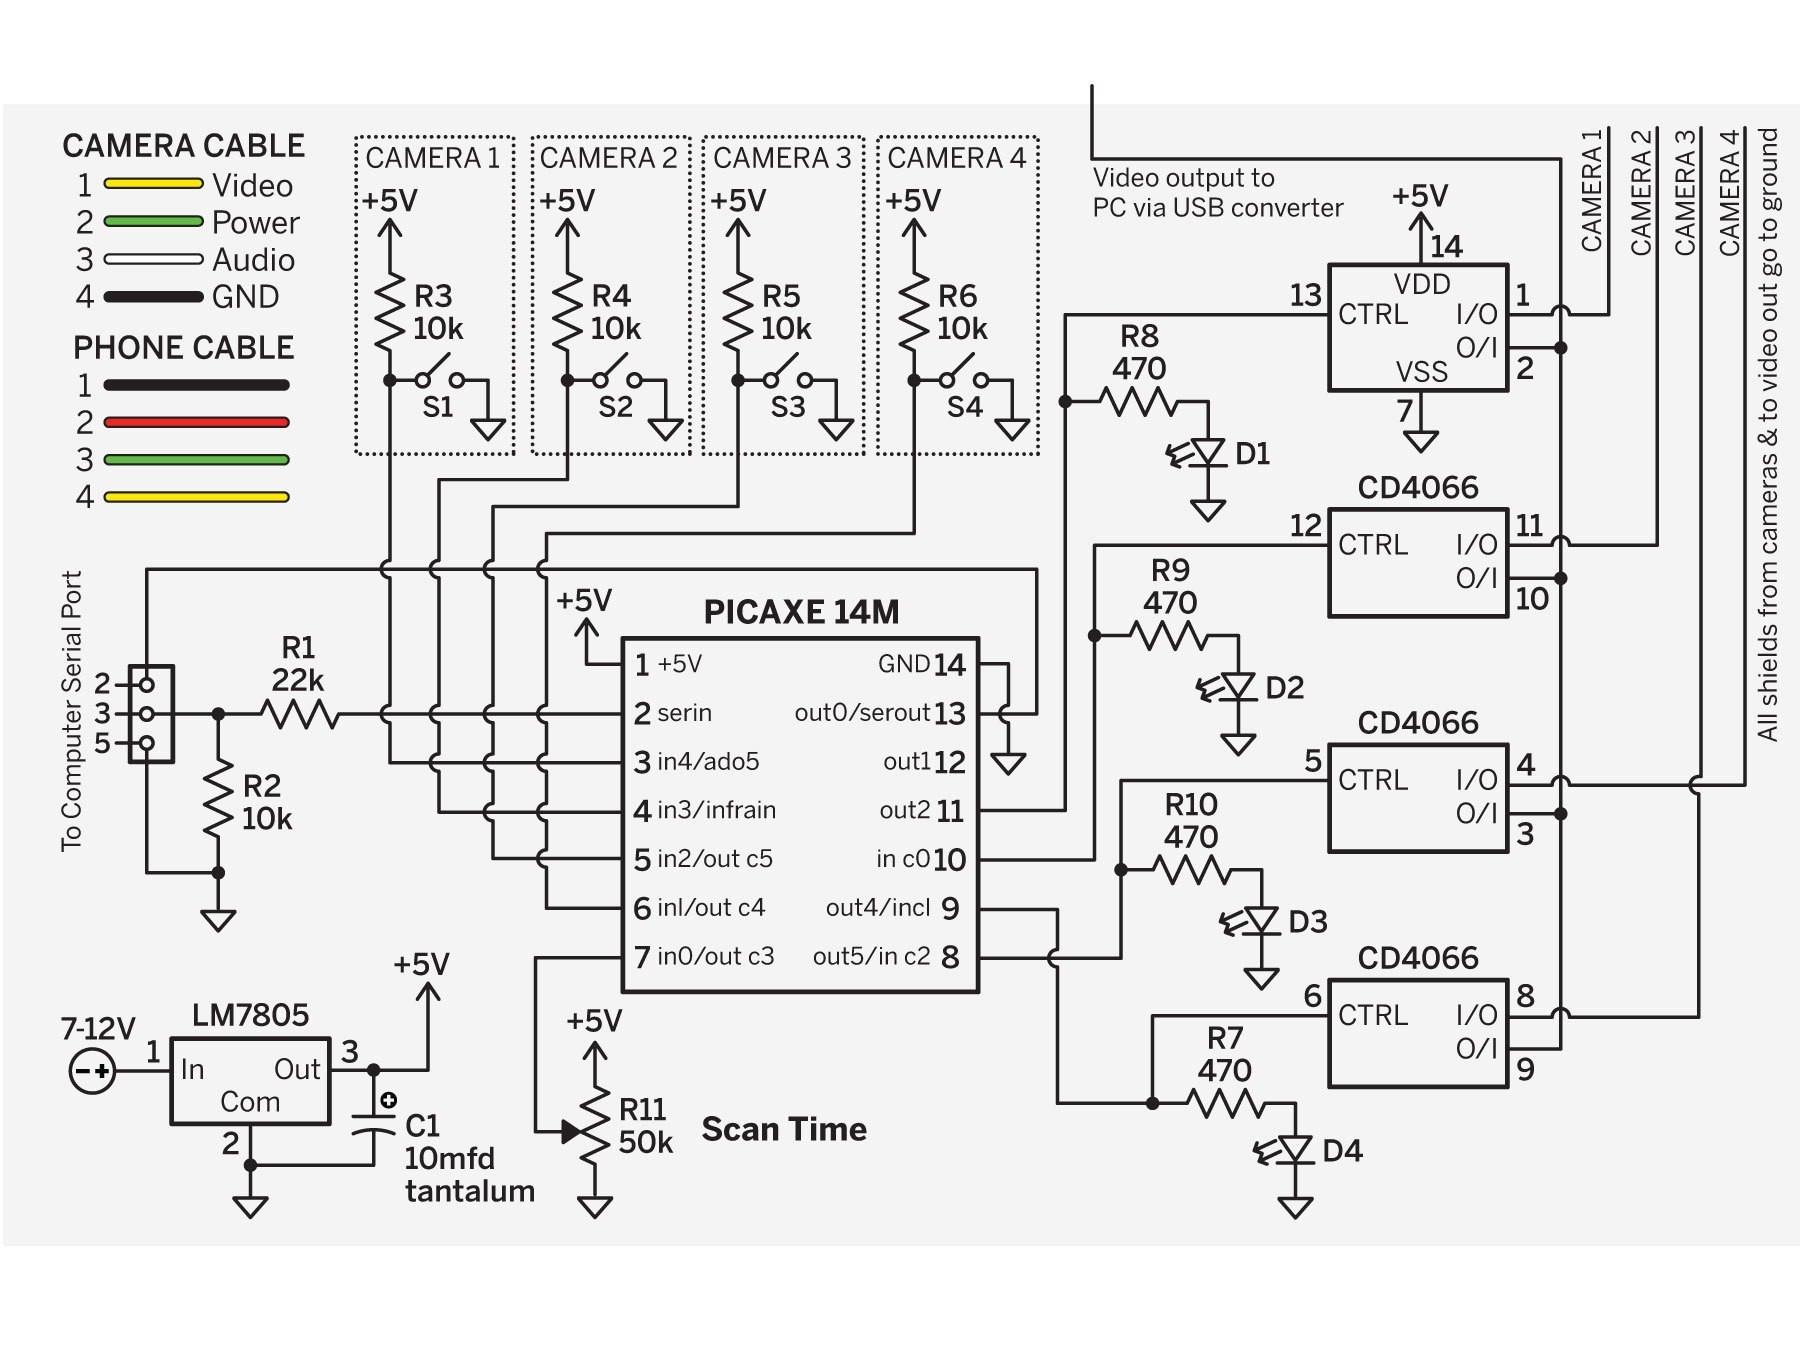 Bunker Hill Security Camera Wiring Diagram   Free Wiring Diagram on orange diagram, burns diagram, buffalo diagram, milton diagram, california diagram,